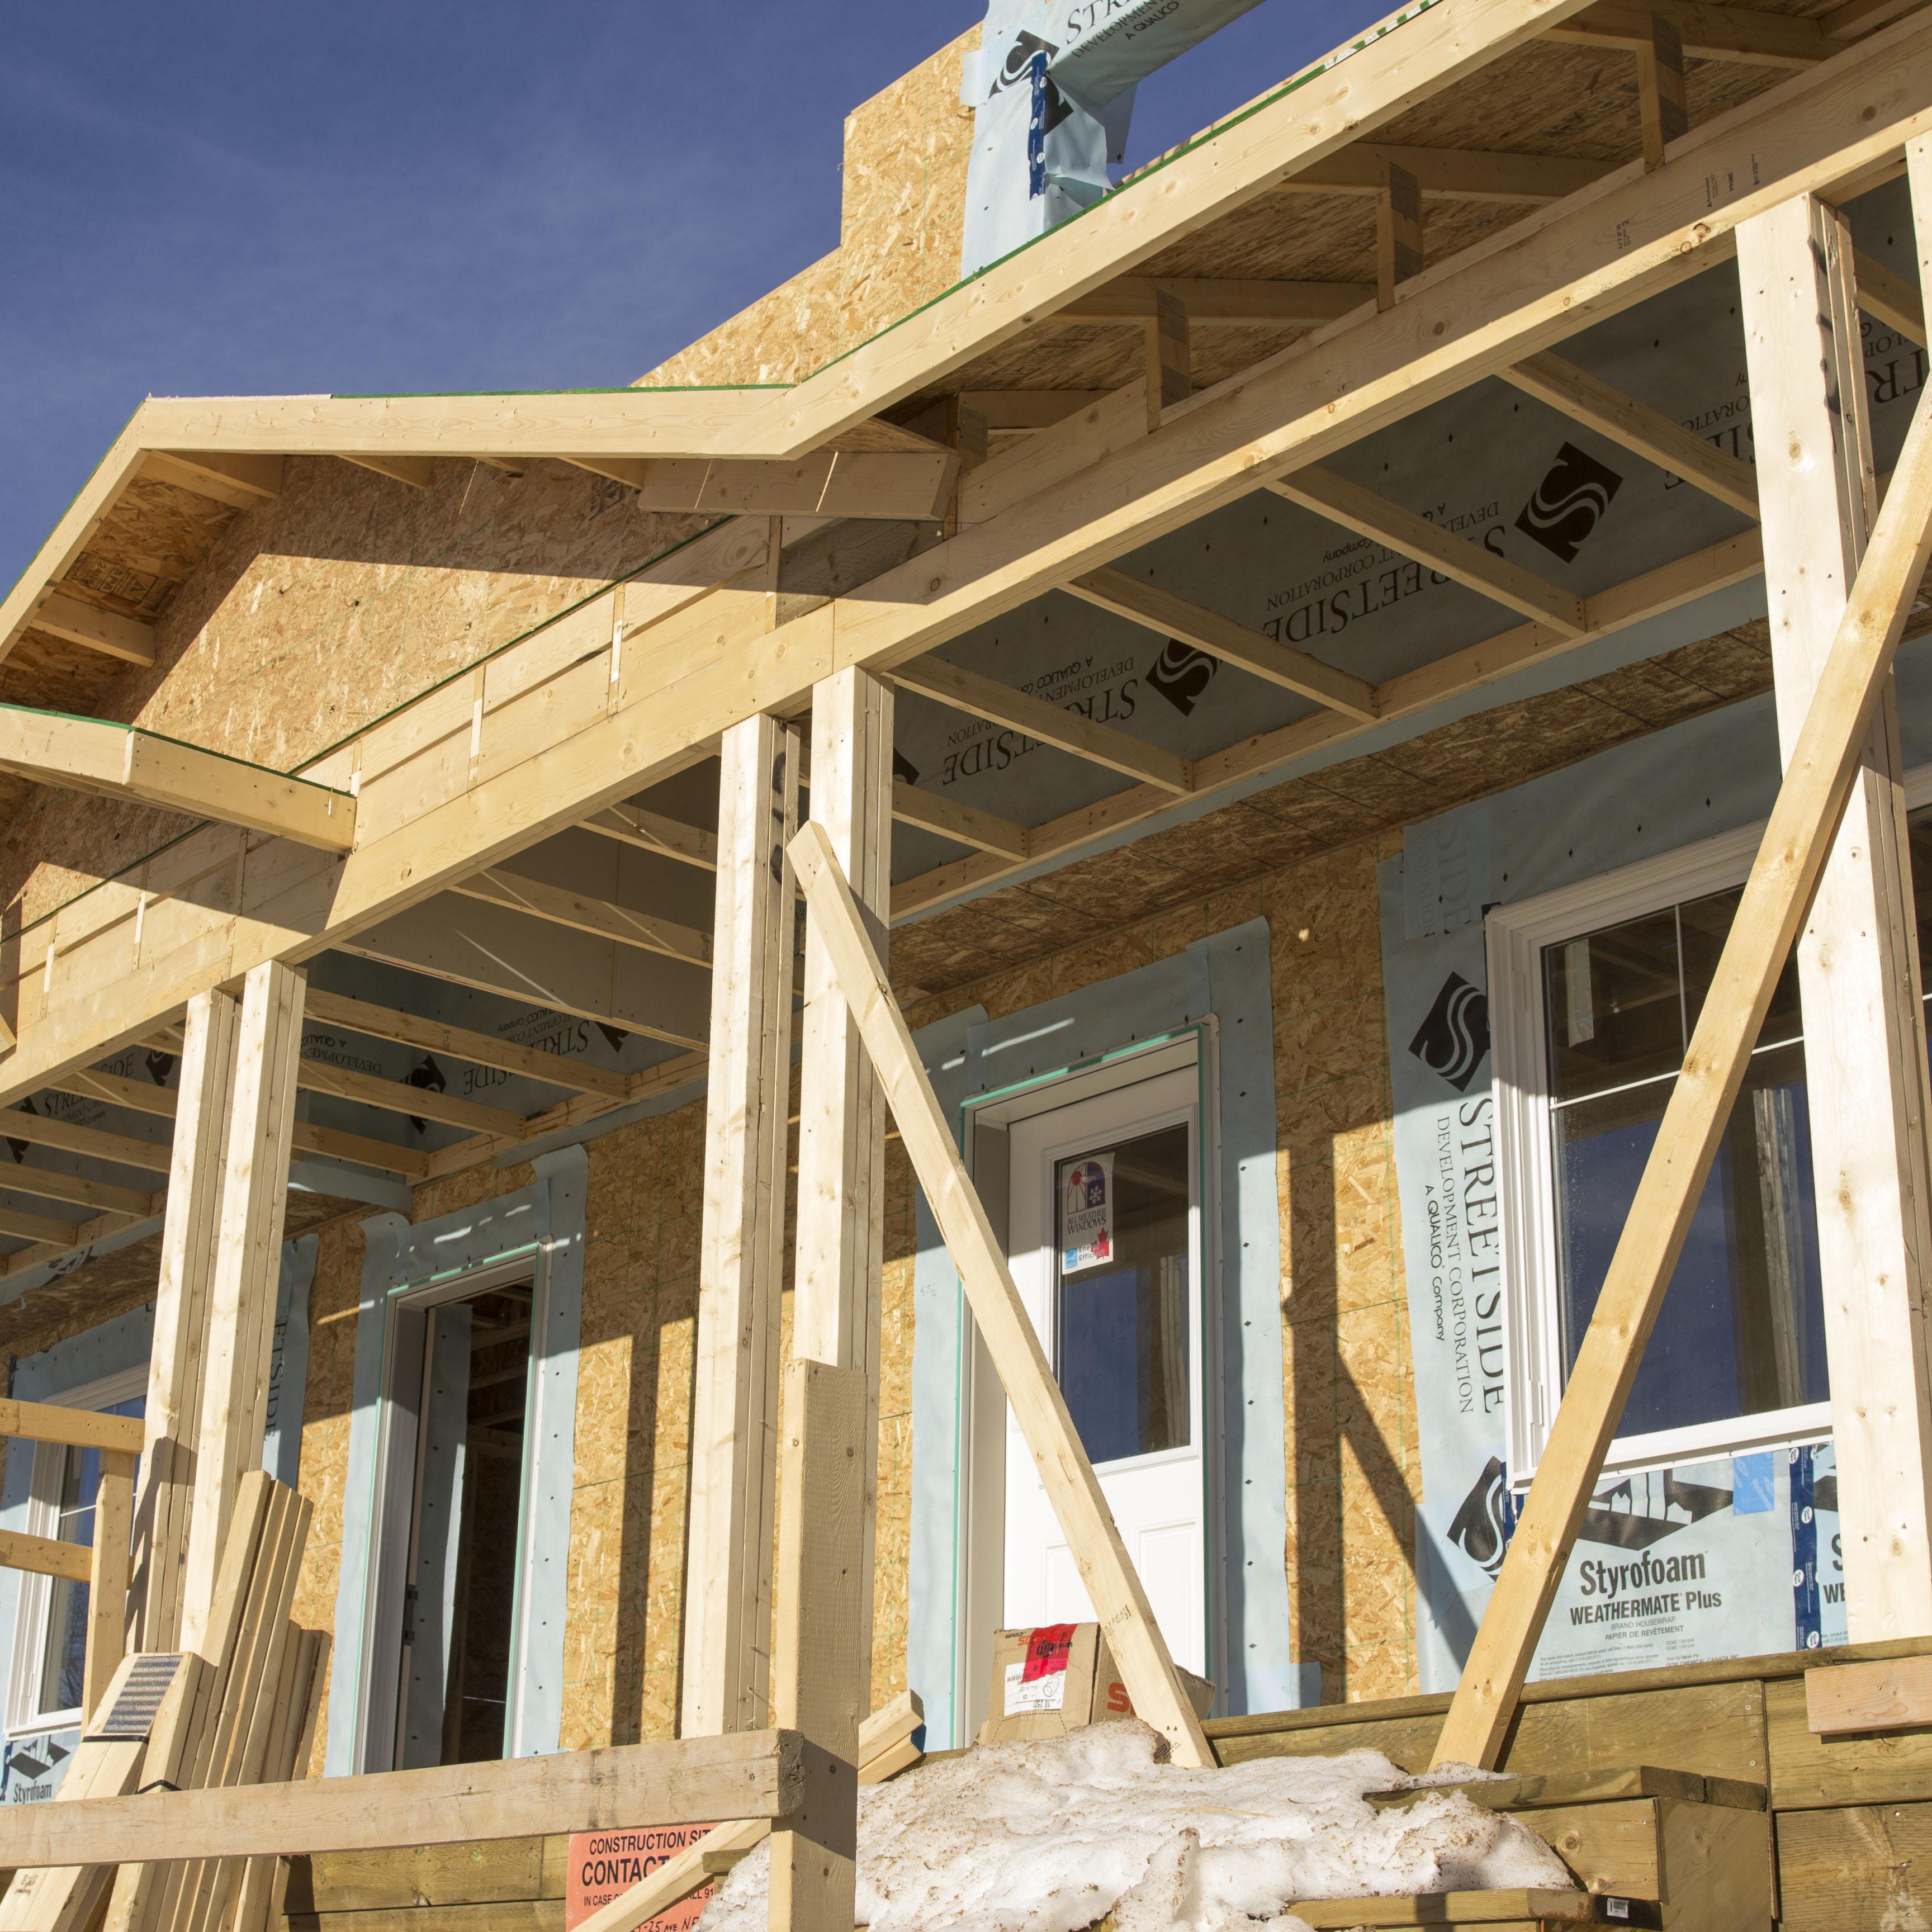 Pineridge Thumbnail Current Build (240x240).jpg title=